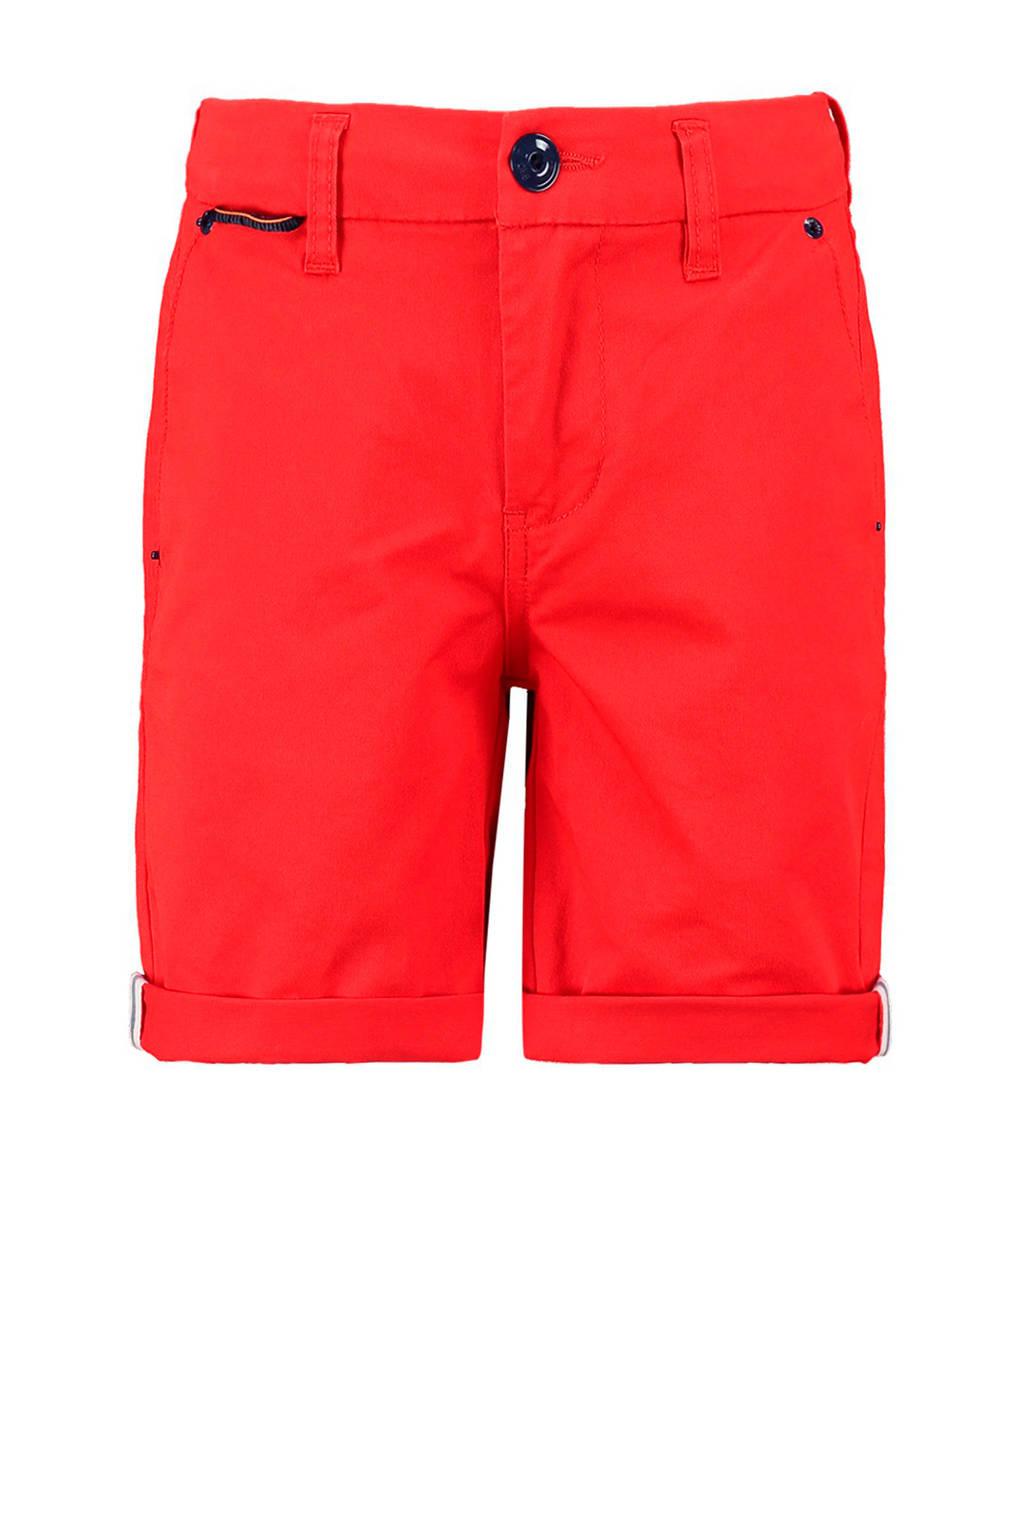 CKS KIDS bermuda Bolton met zijstreep rood, Rood/wit/donkerblauw